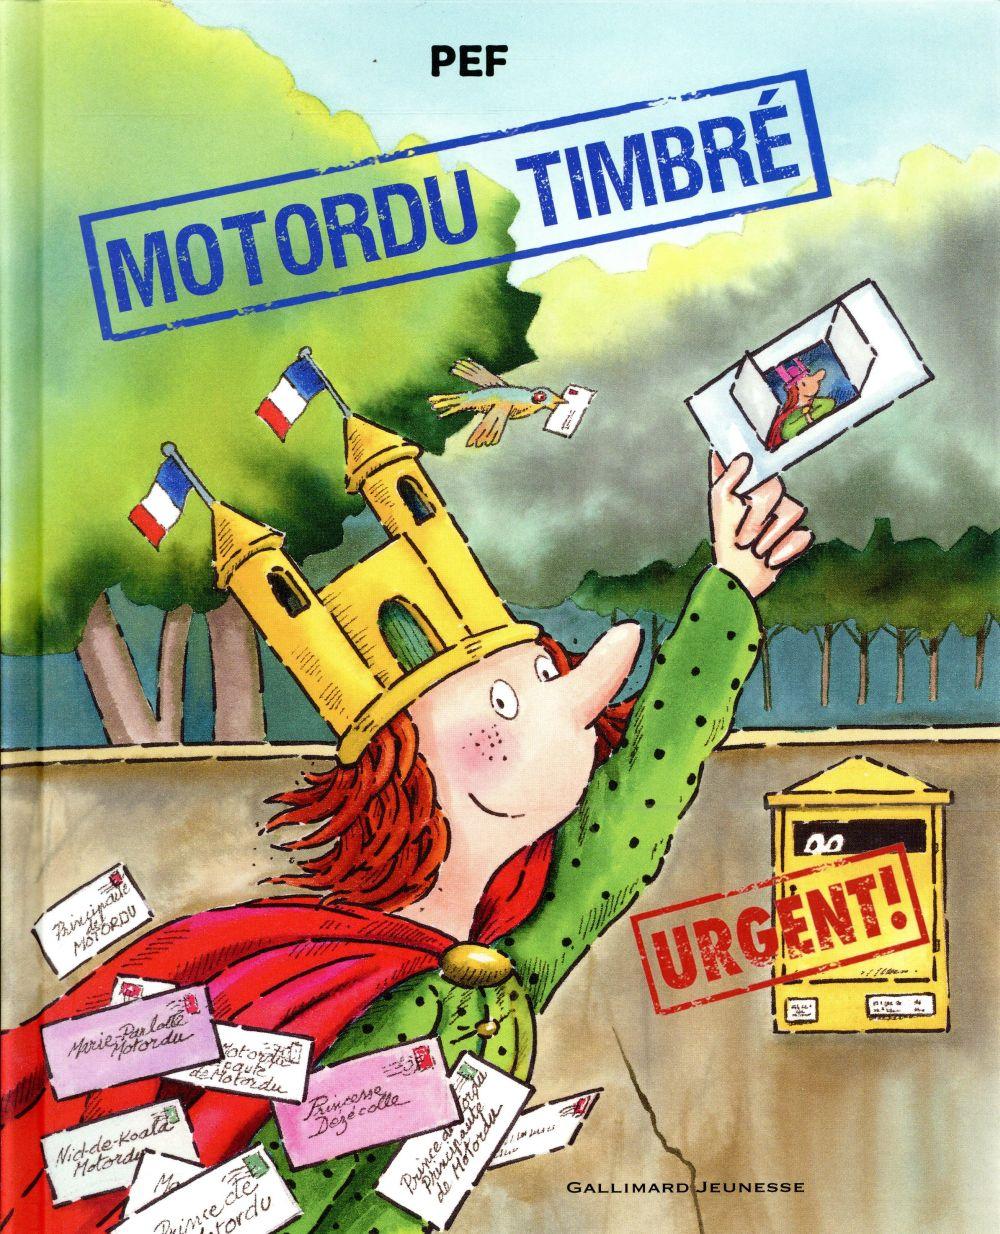 MOTORDU TIMBRE PEF Gallimard-Jeunesse